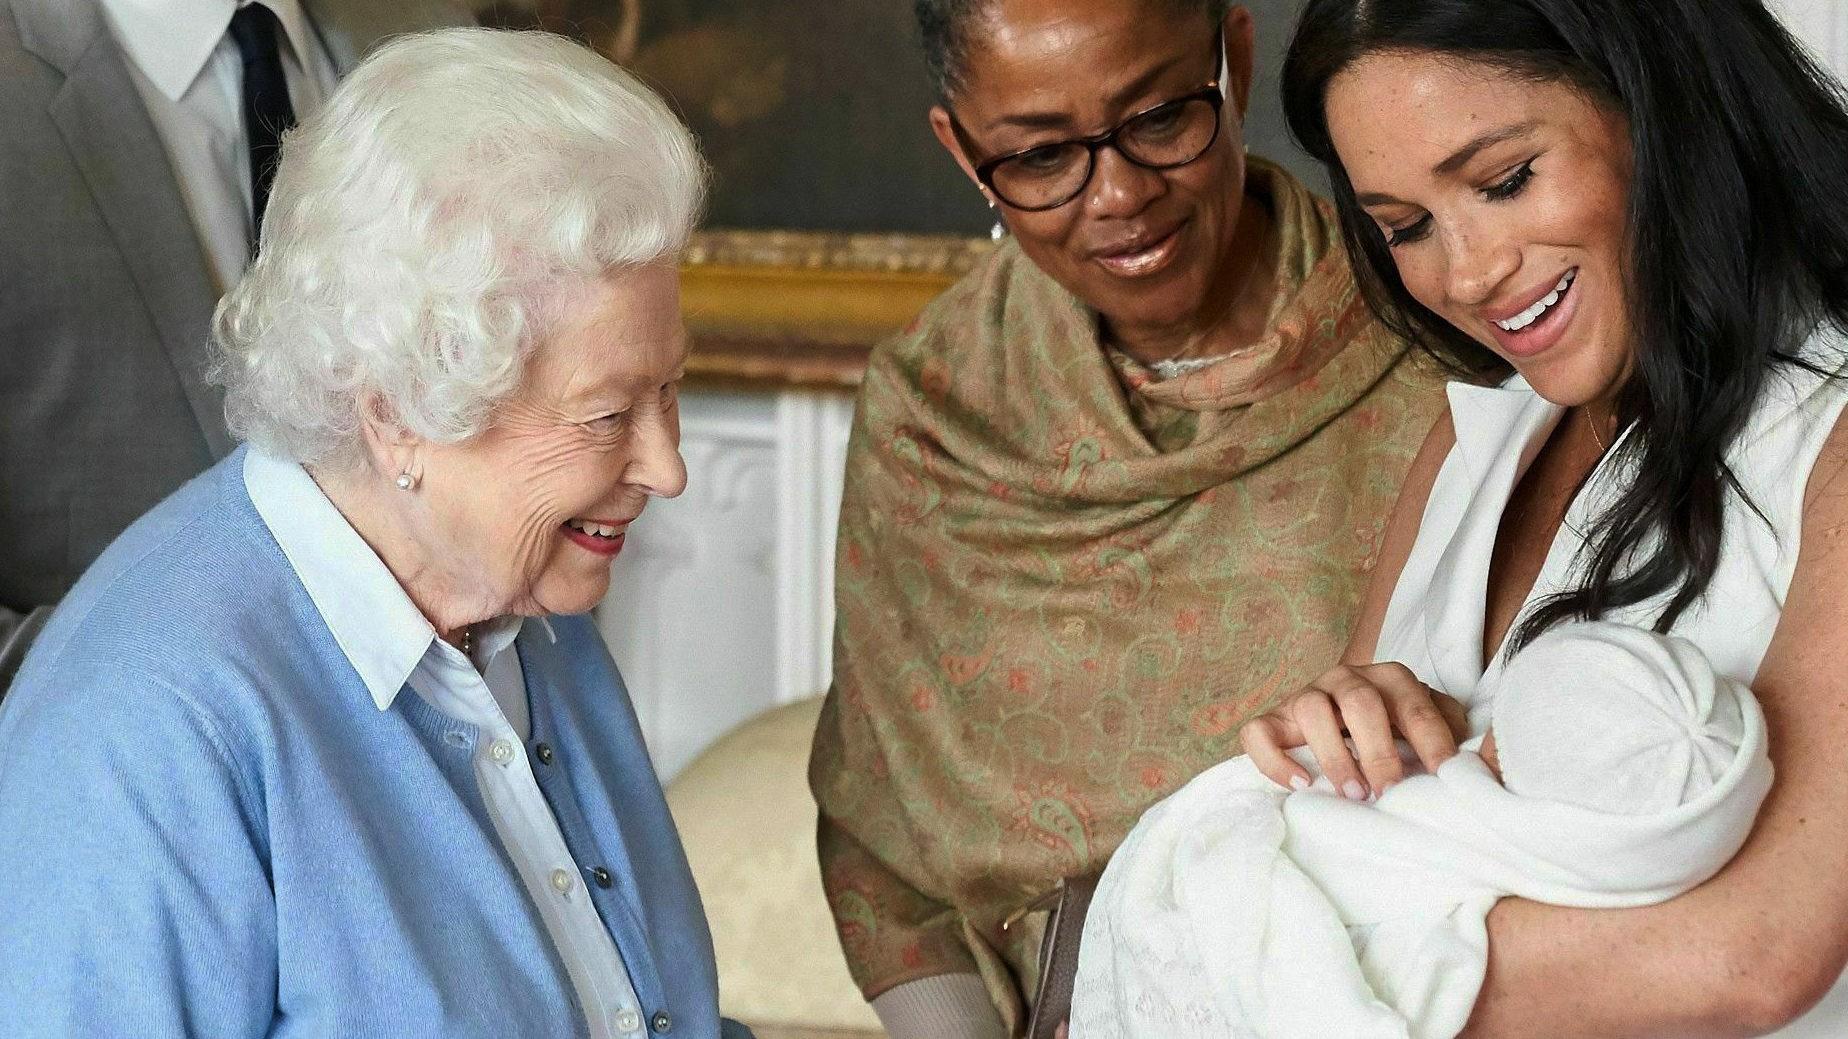 Herzogin Meghan Will Baby Aus Afrika Adoptieren Kroneat